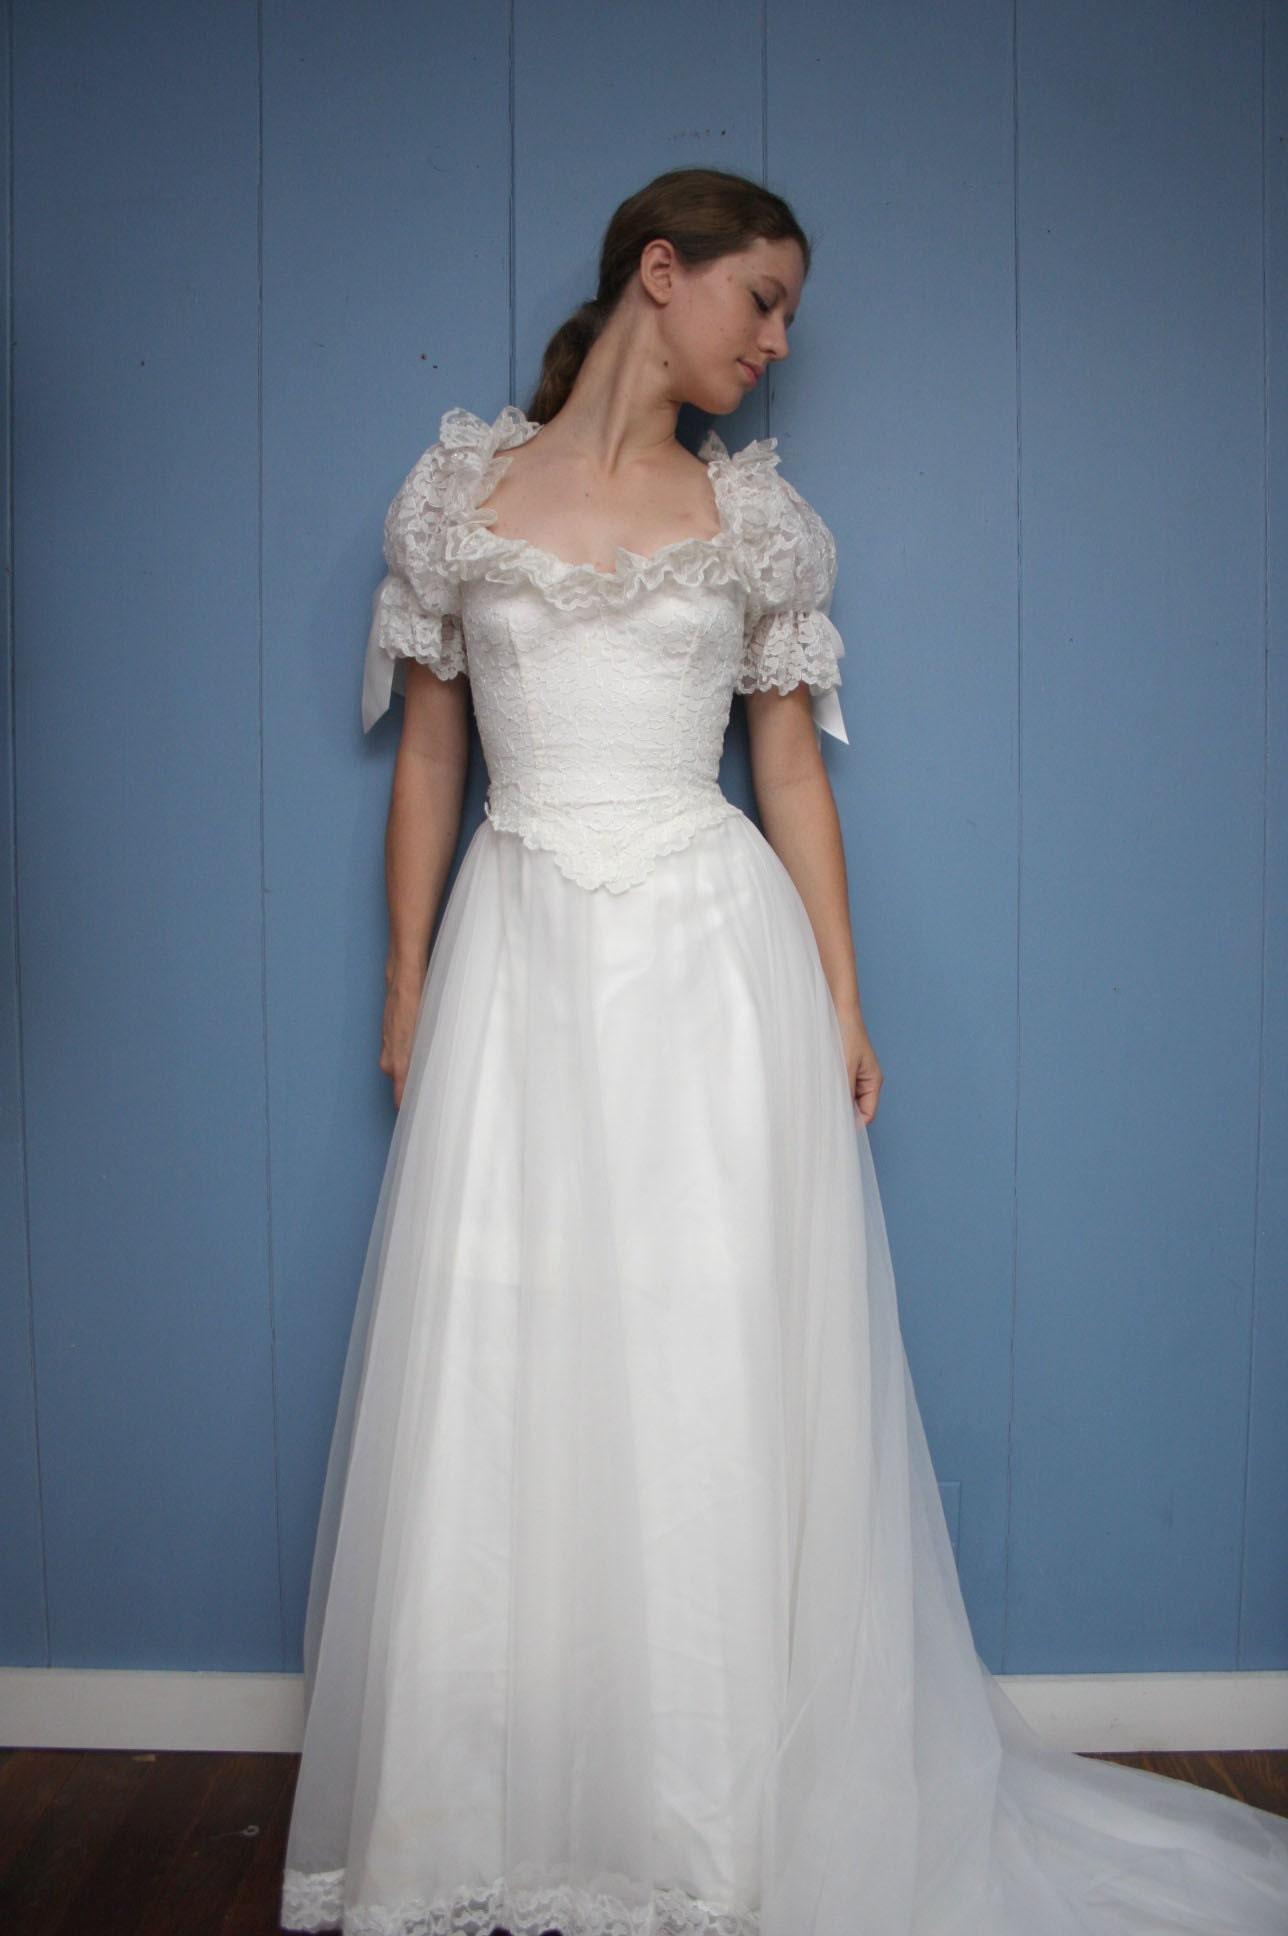 Southern Belle Bridesmaid Dresses - Wedding Dress Buy Online Usa